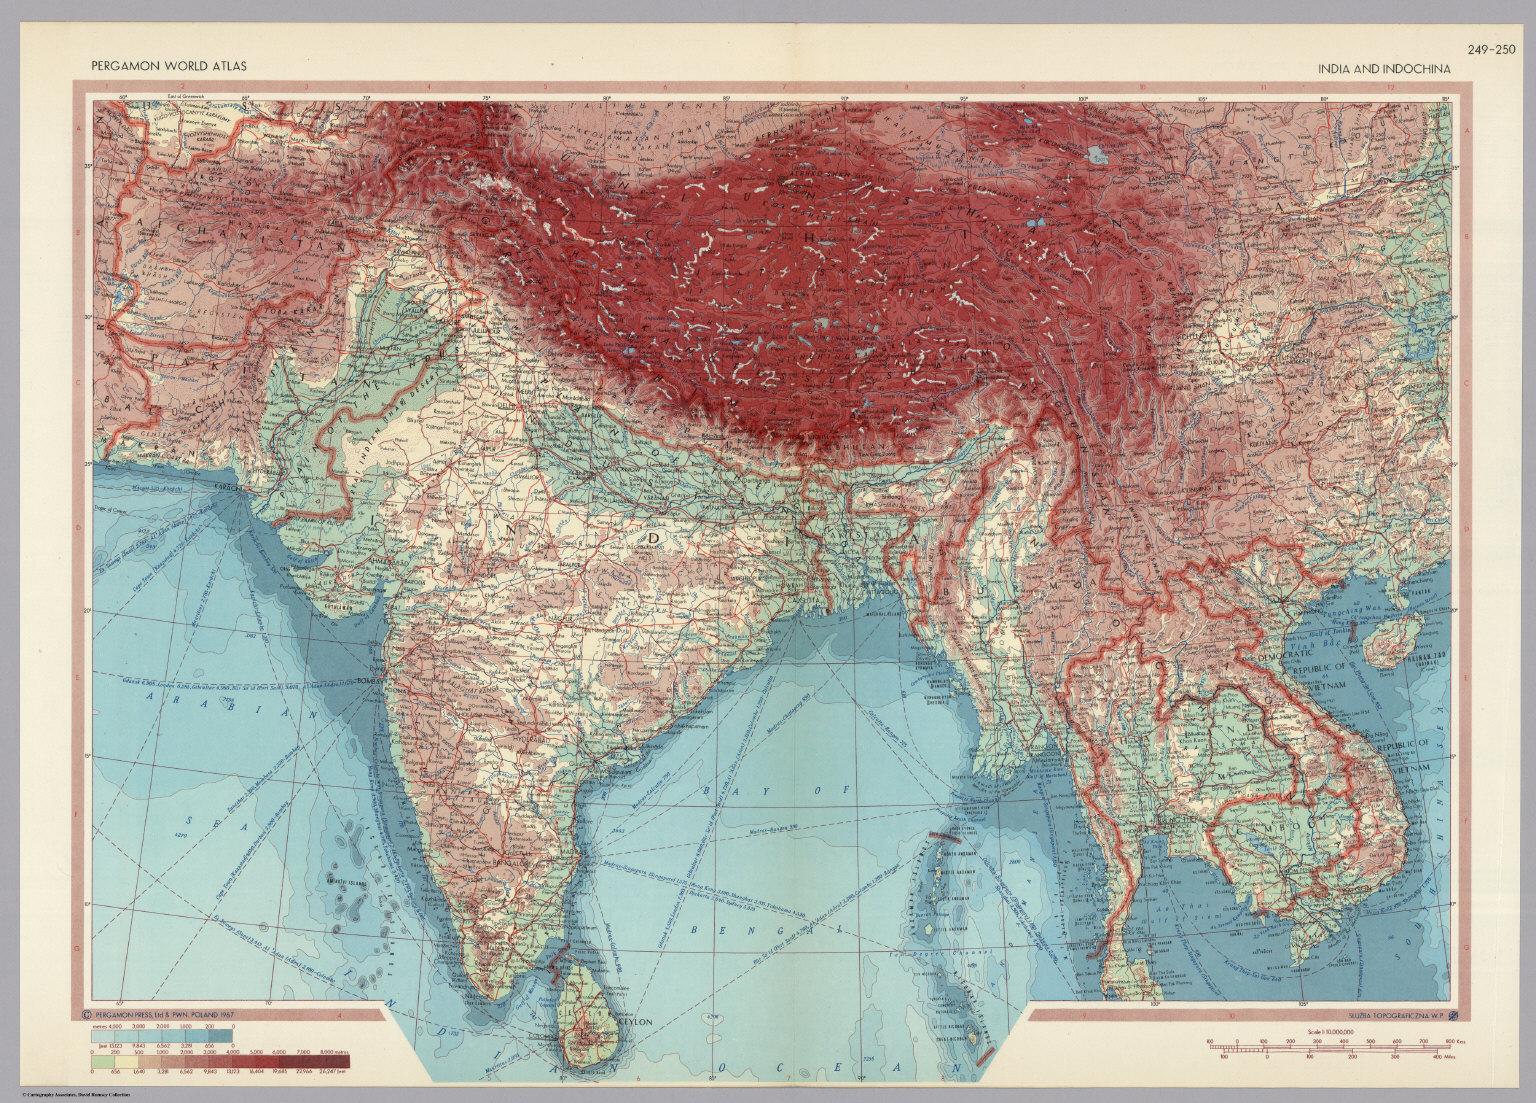 India and indochina pergamon world atlas david rumsey historical india and indochina pergamon world atlas gumiabroncs Image collections